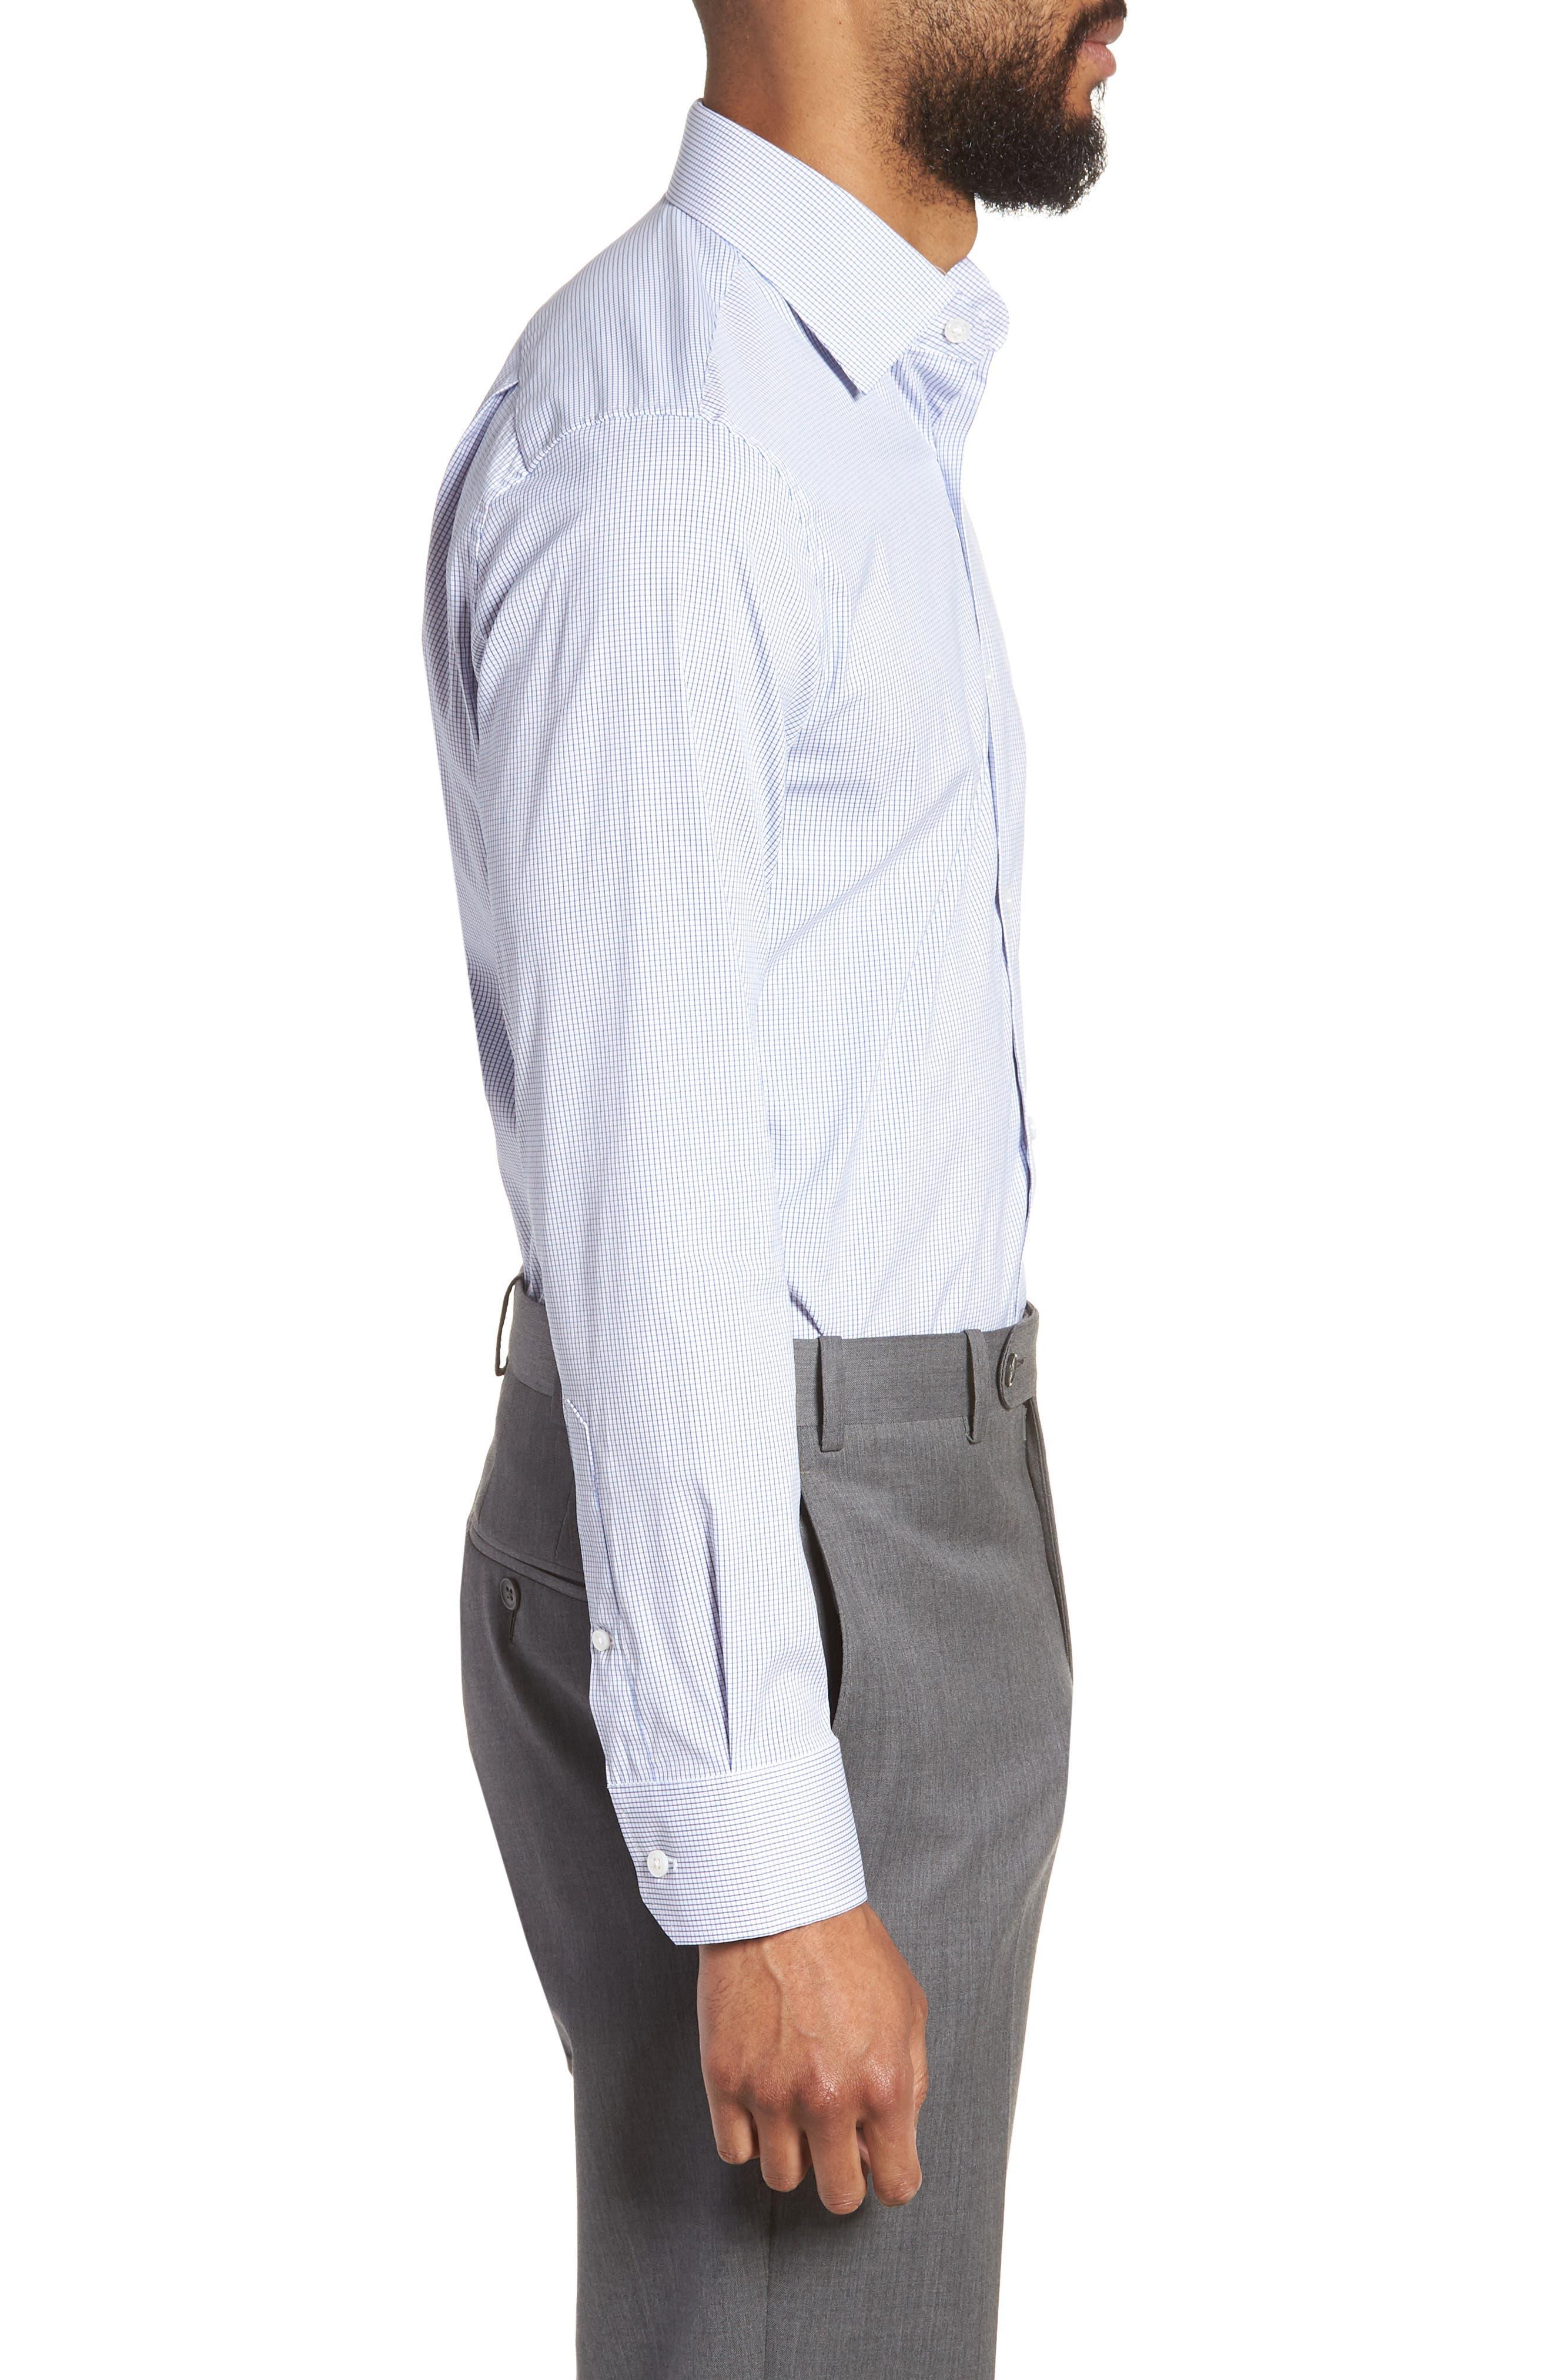 Jetsetter Slim Fit Stretch Check Dress Shirt,                             Alternate thumbnail 4, color,                             NAVY MINI CHECK